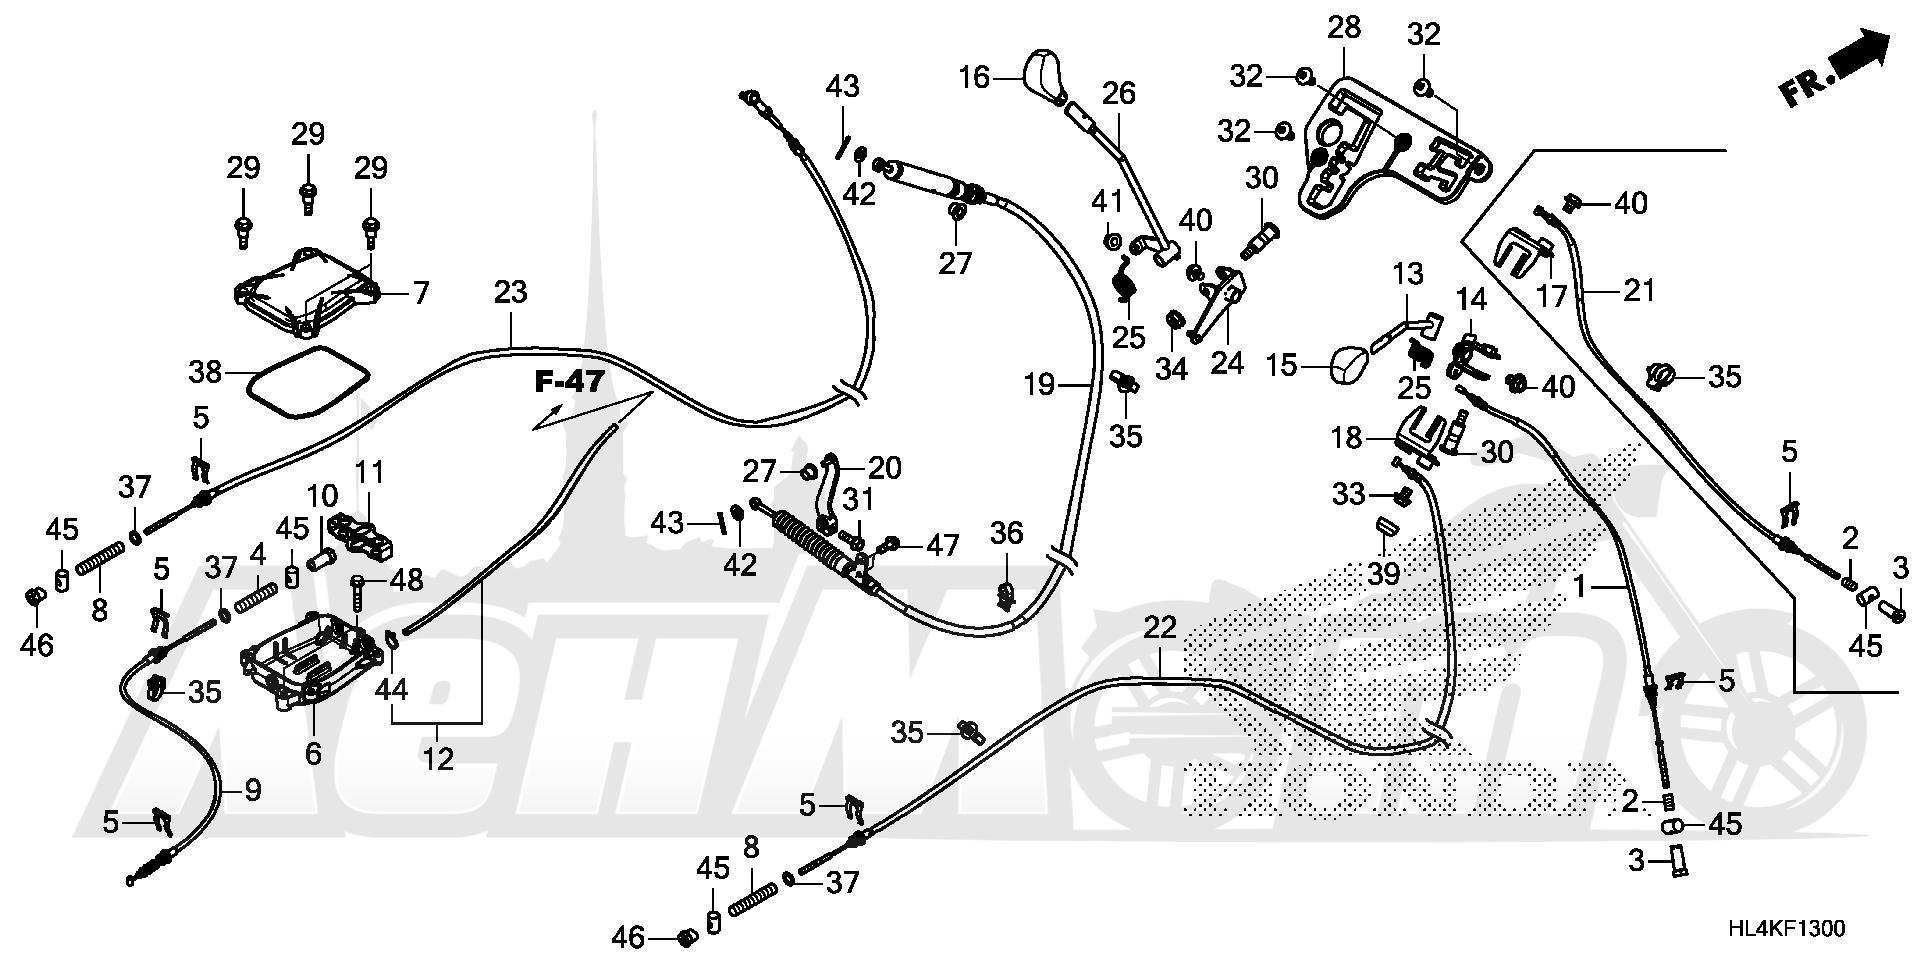 Запчасти для Квадроцикла Honda 2019 SXS1000M5D Раздел: SHIFT LEVER AND SELECT LEVER | лапка переключения и SELECT рычаг